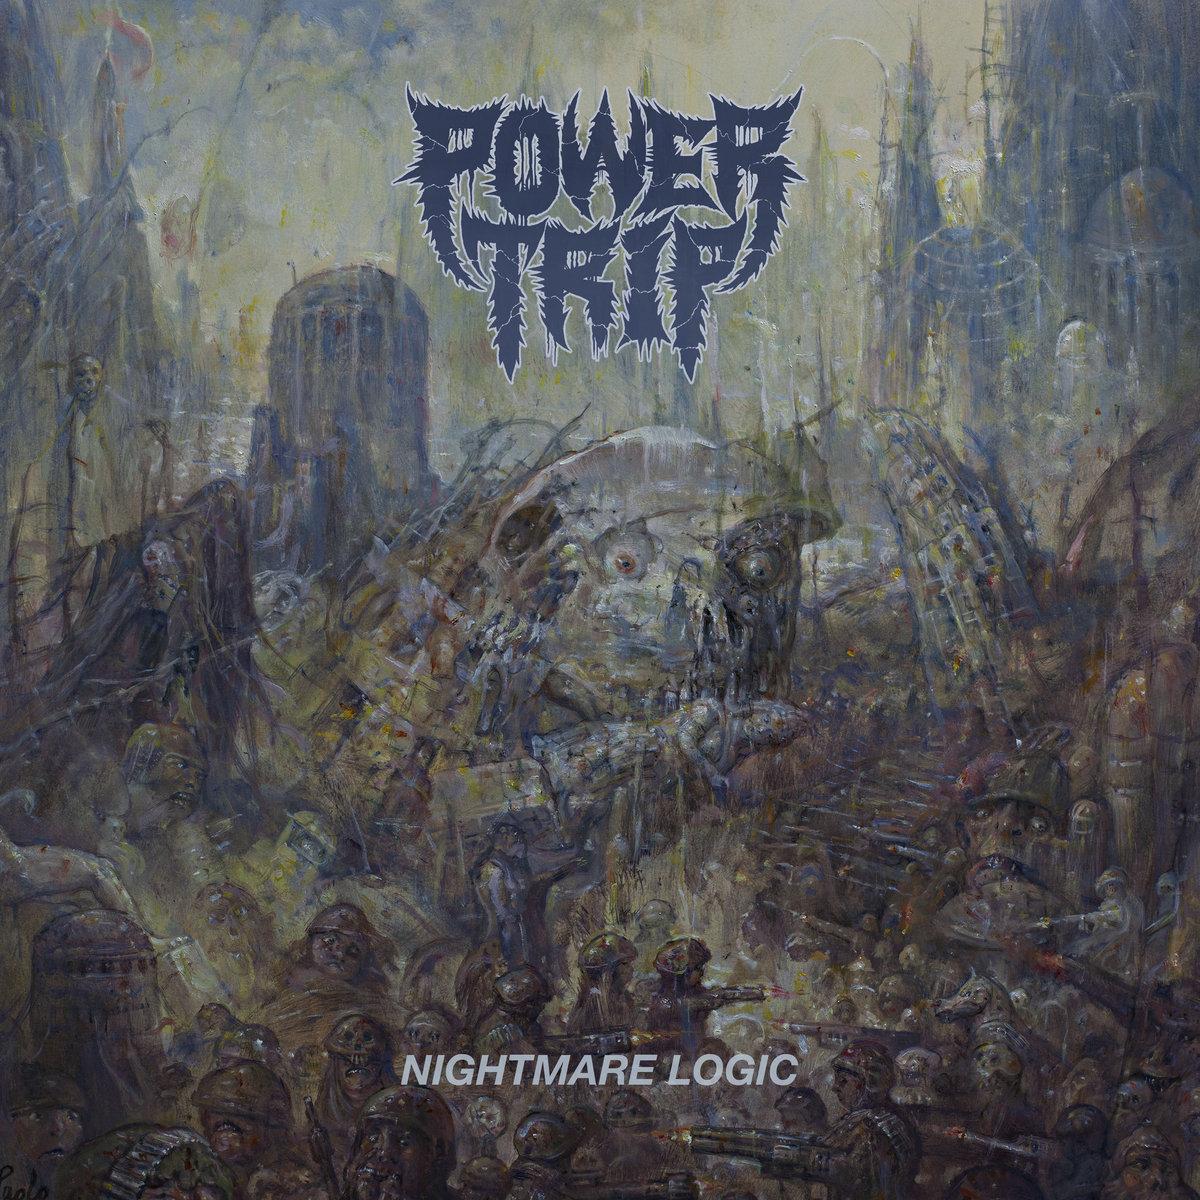 14. Power Trip - Nightmare Logic